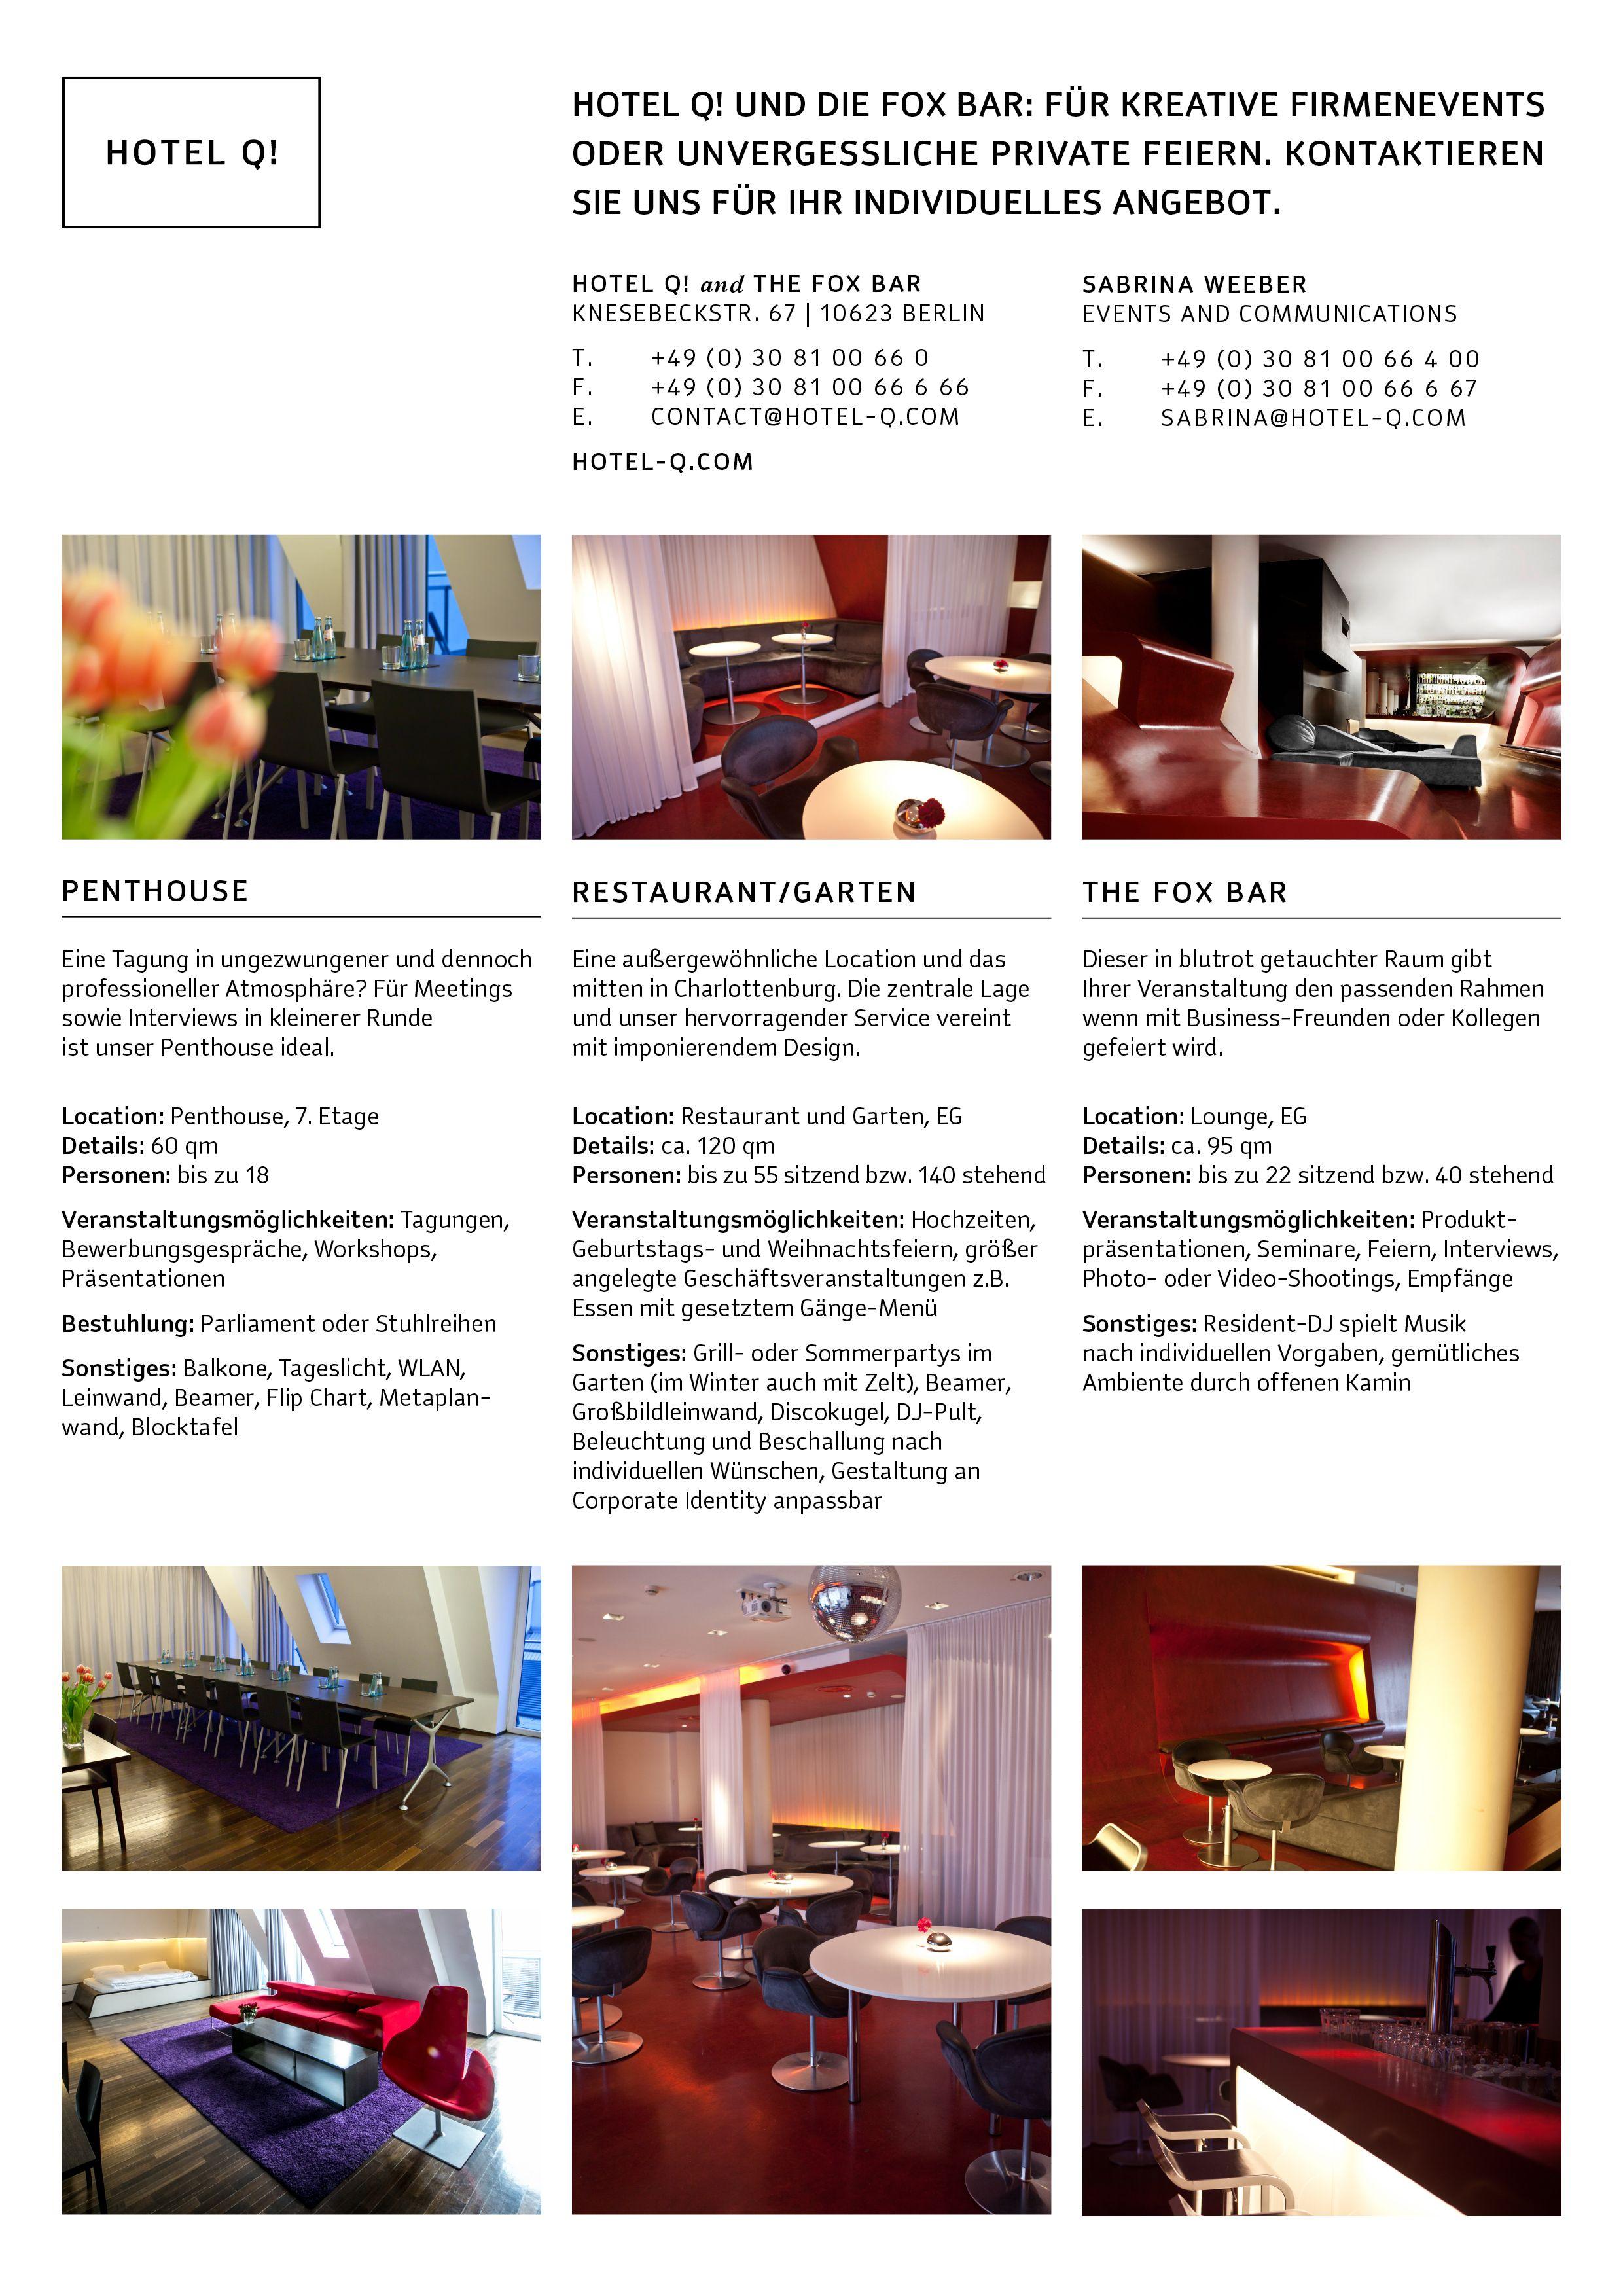 Hotel Q! Events Factsheet | All About Art | Pinterest